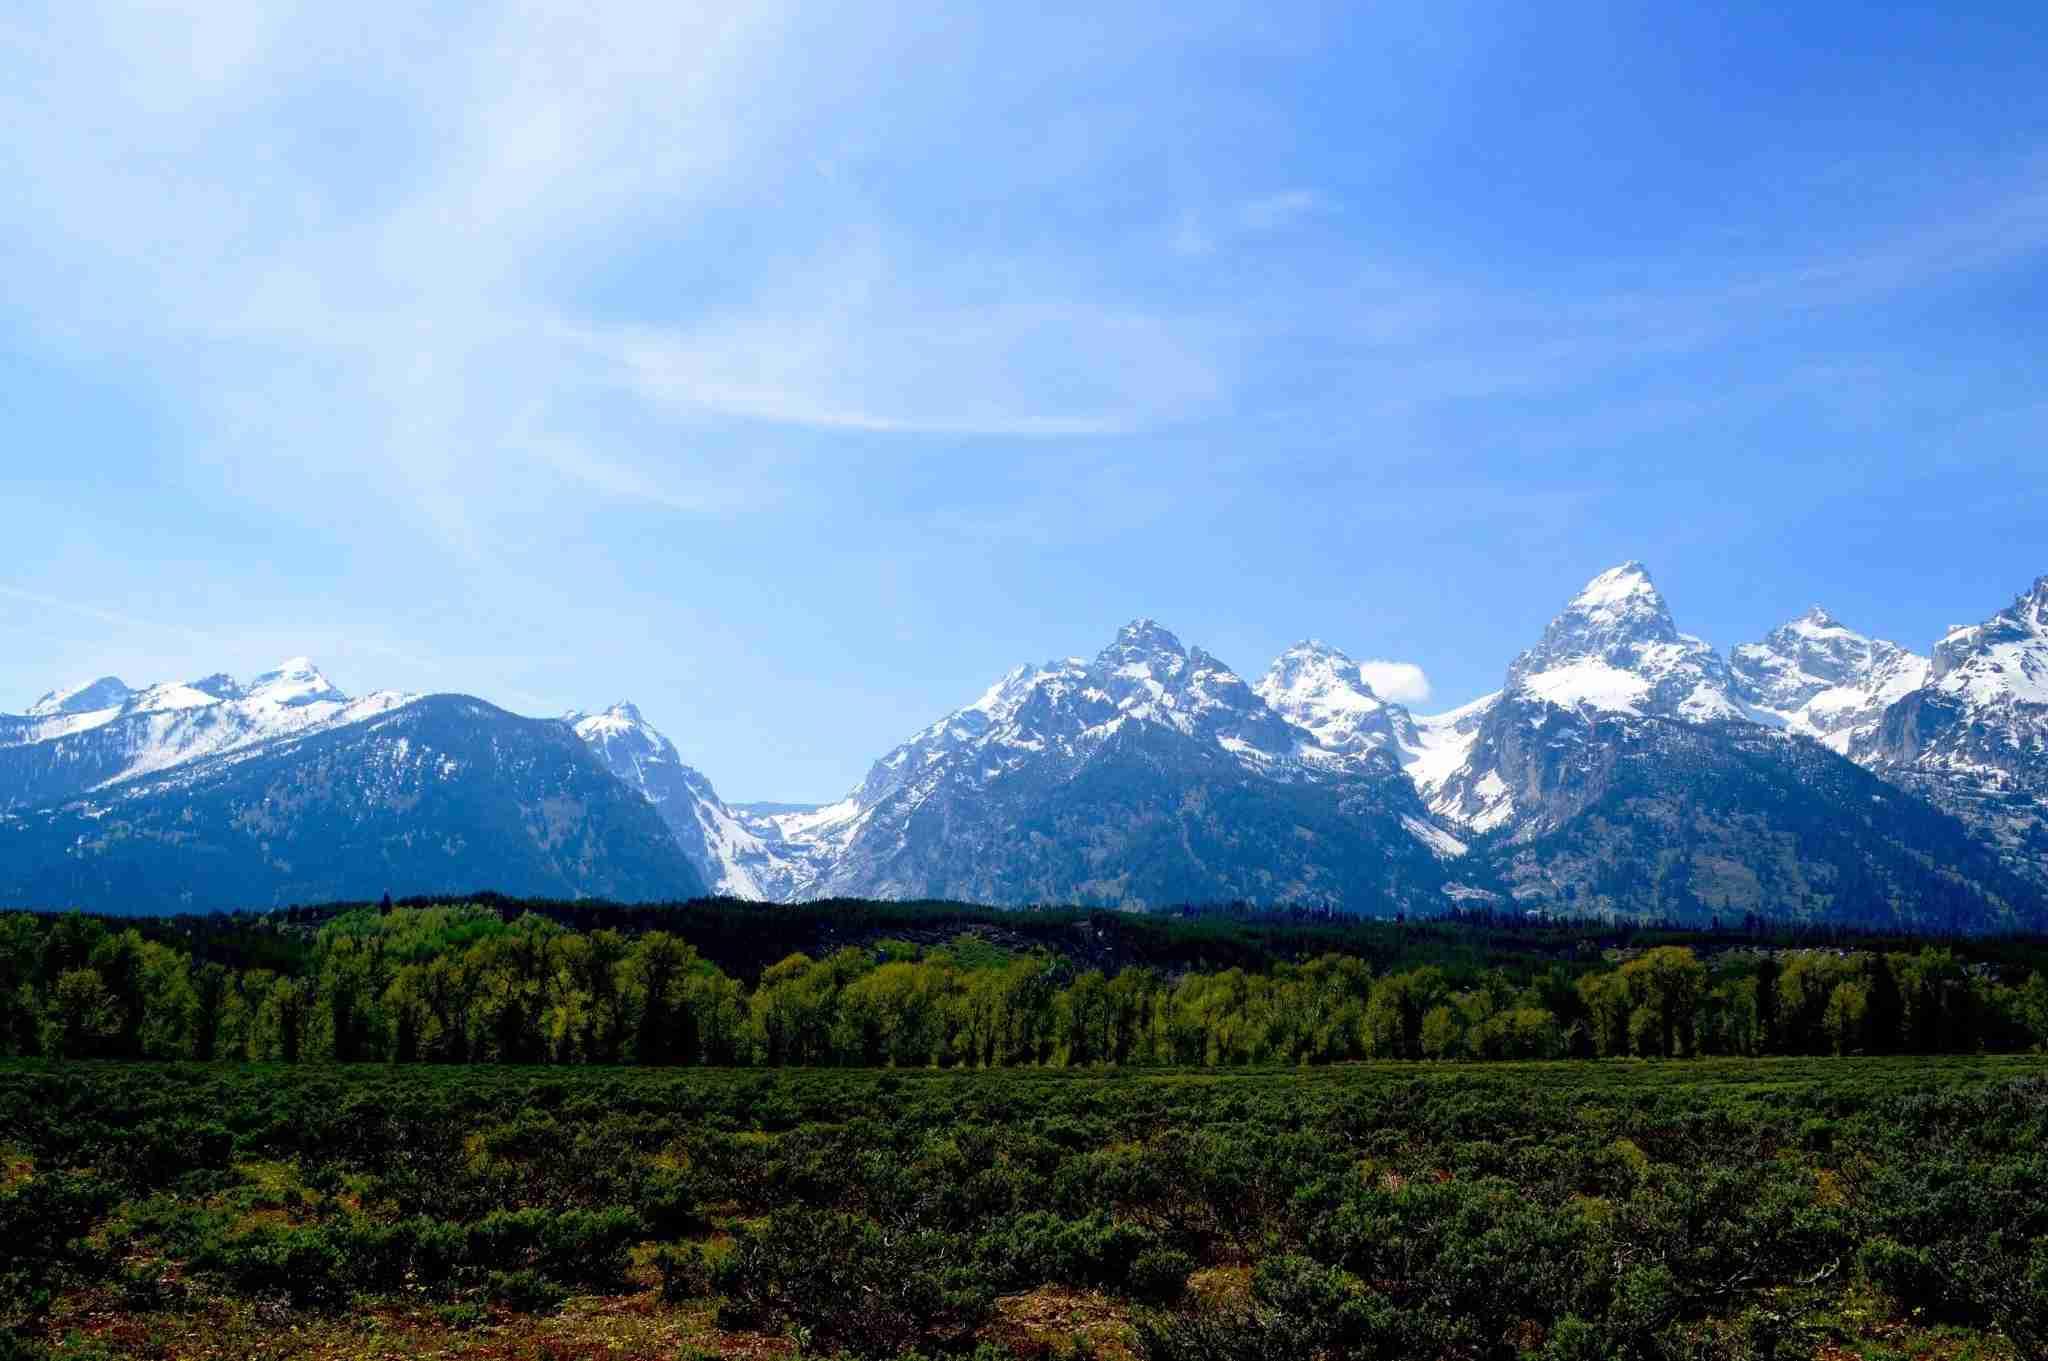 Grand Teton National Park (Photo by Liz Hund/TPG)